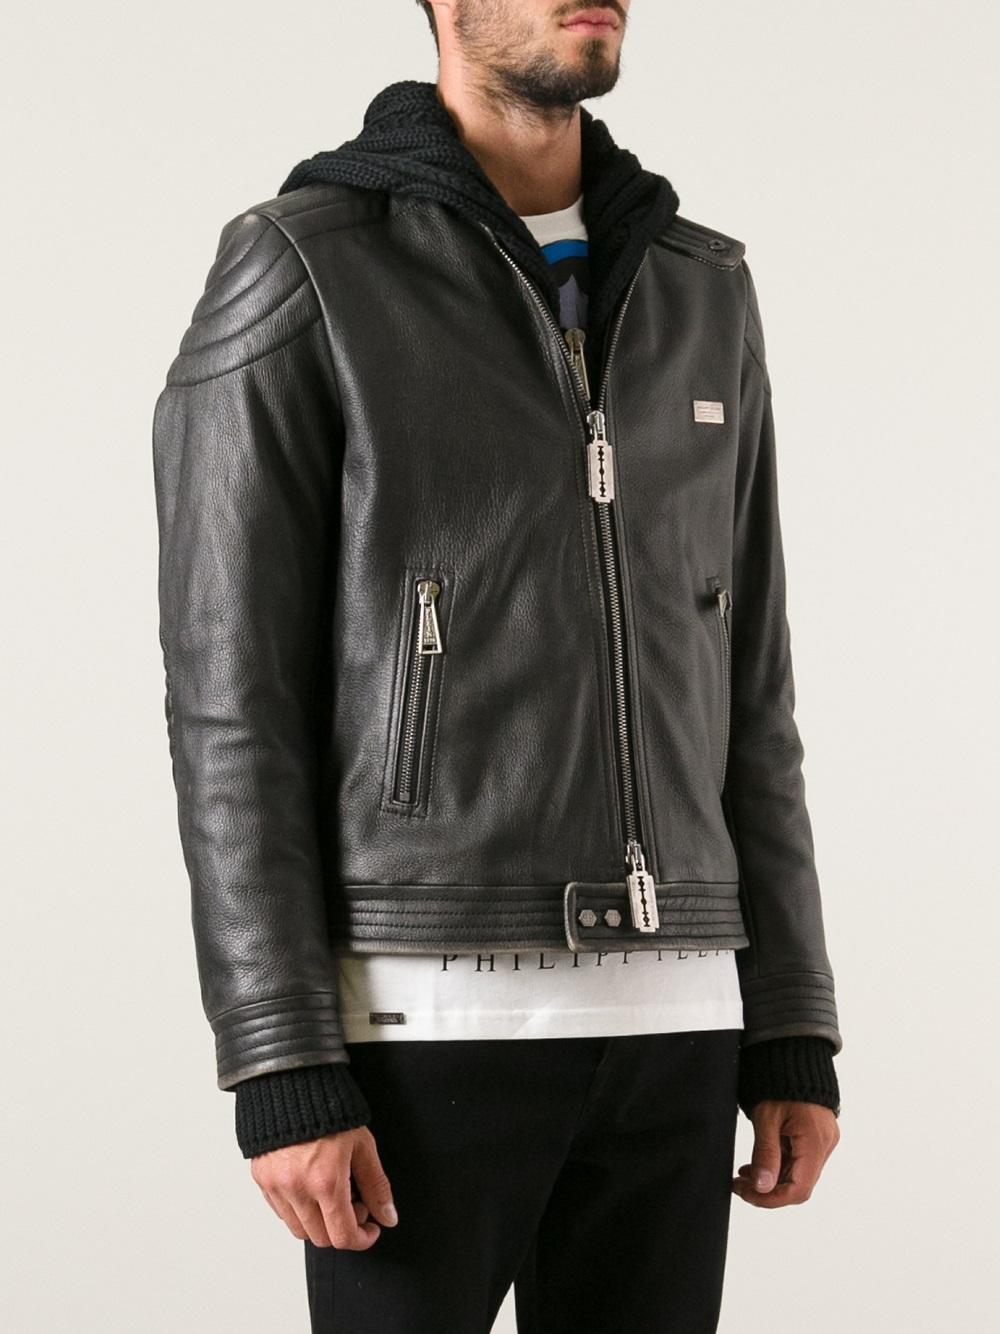 philipp plein stud skull leather jacket in black for men lyst. Black Bedroom Furniture Sets. Home Design Ideas